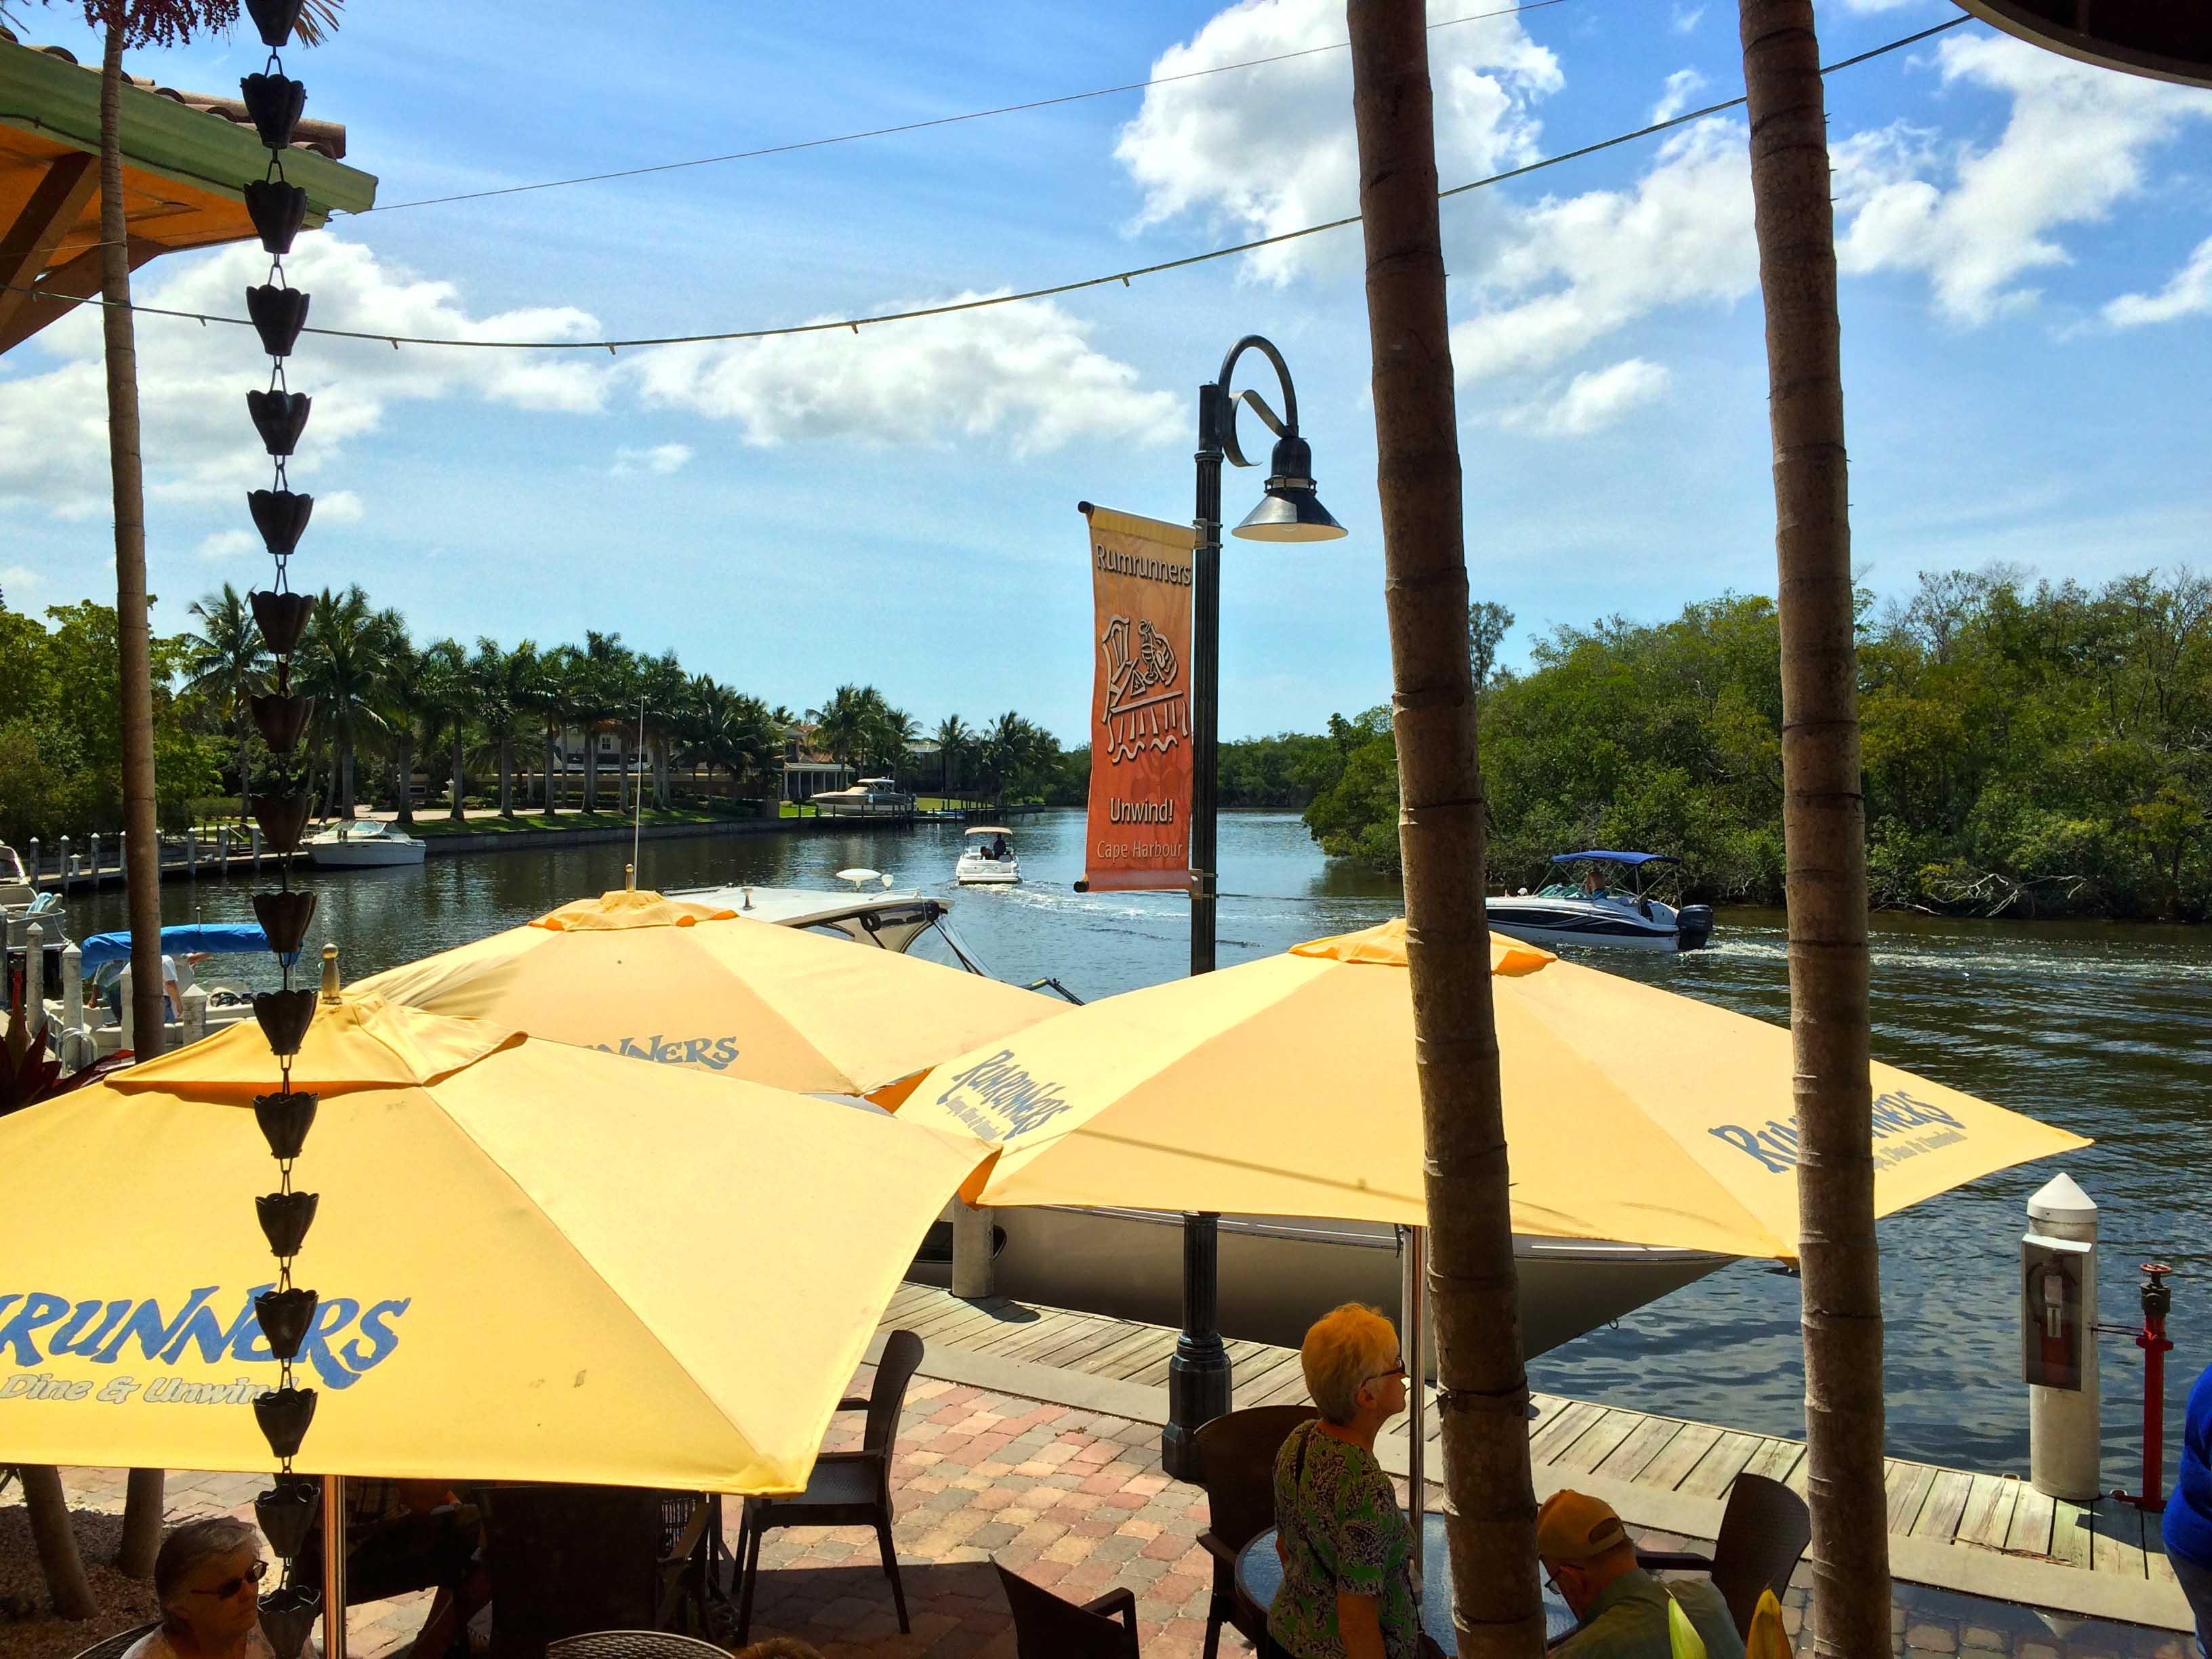 cape-coral-ammenities-cape-harbour-rum-runners-restaurant.jpg